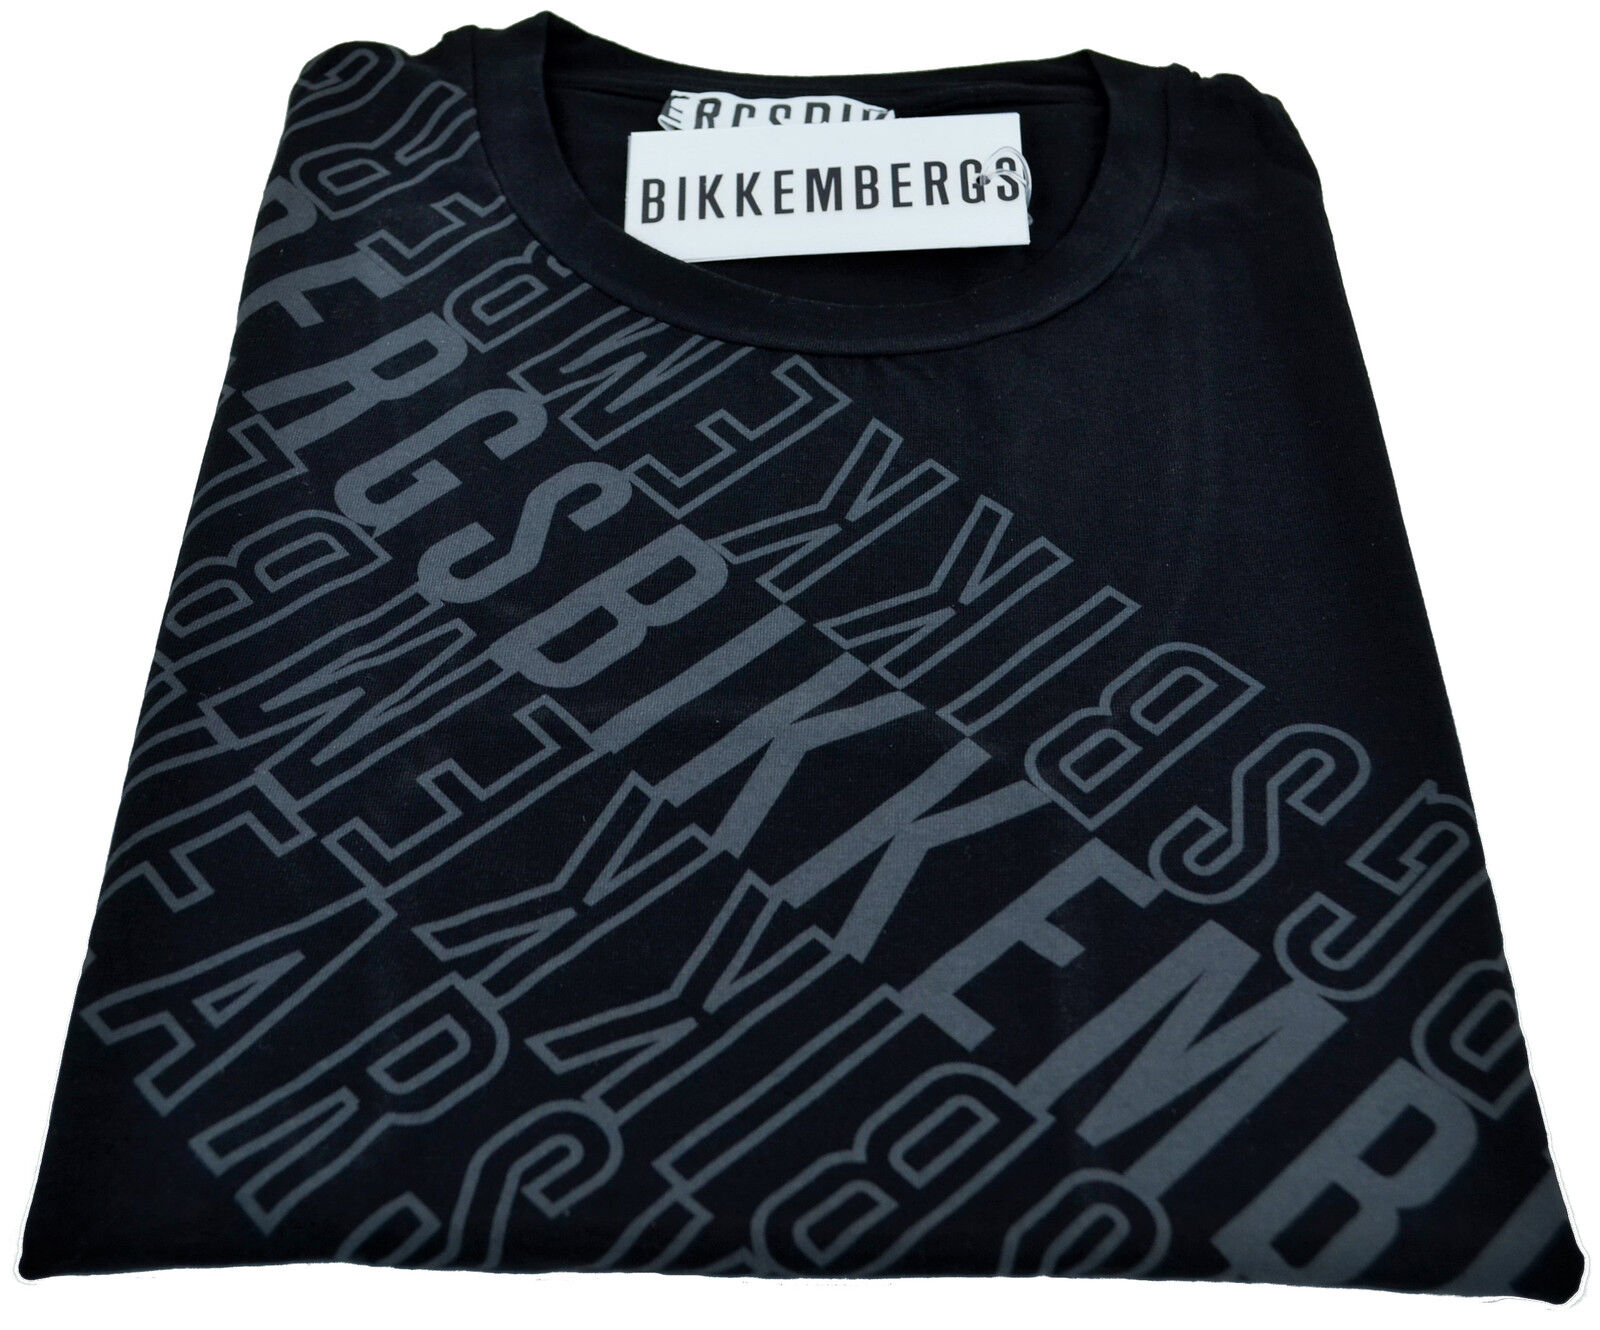 Bikkembergs T-shirt Sea Made in